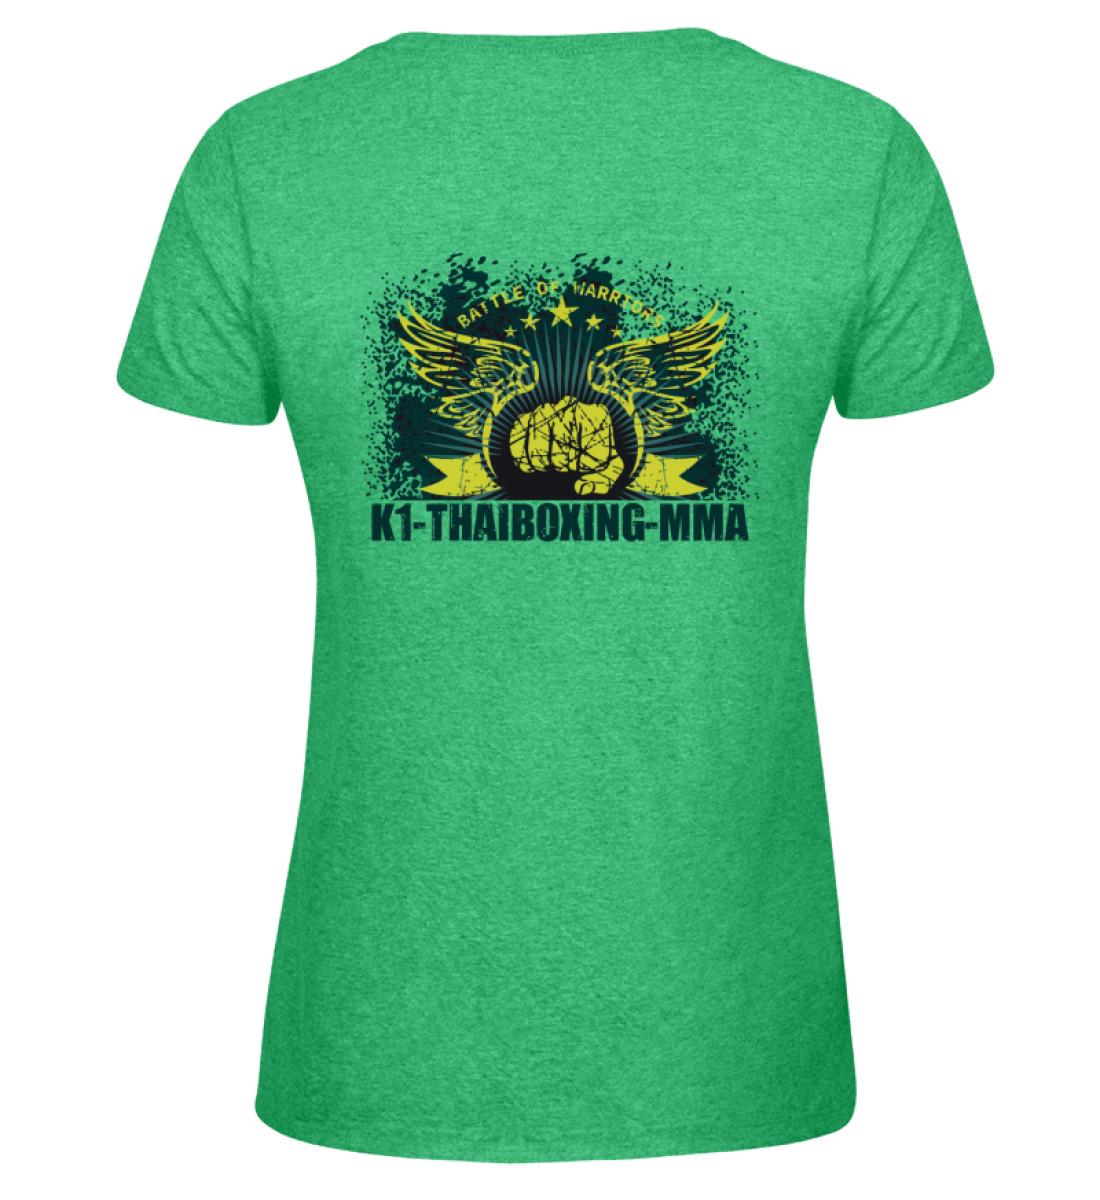 COMA T-Shirt K1-Thaiboxing-MMA - Damen Melange Shirt-6804